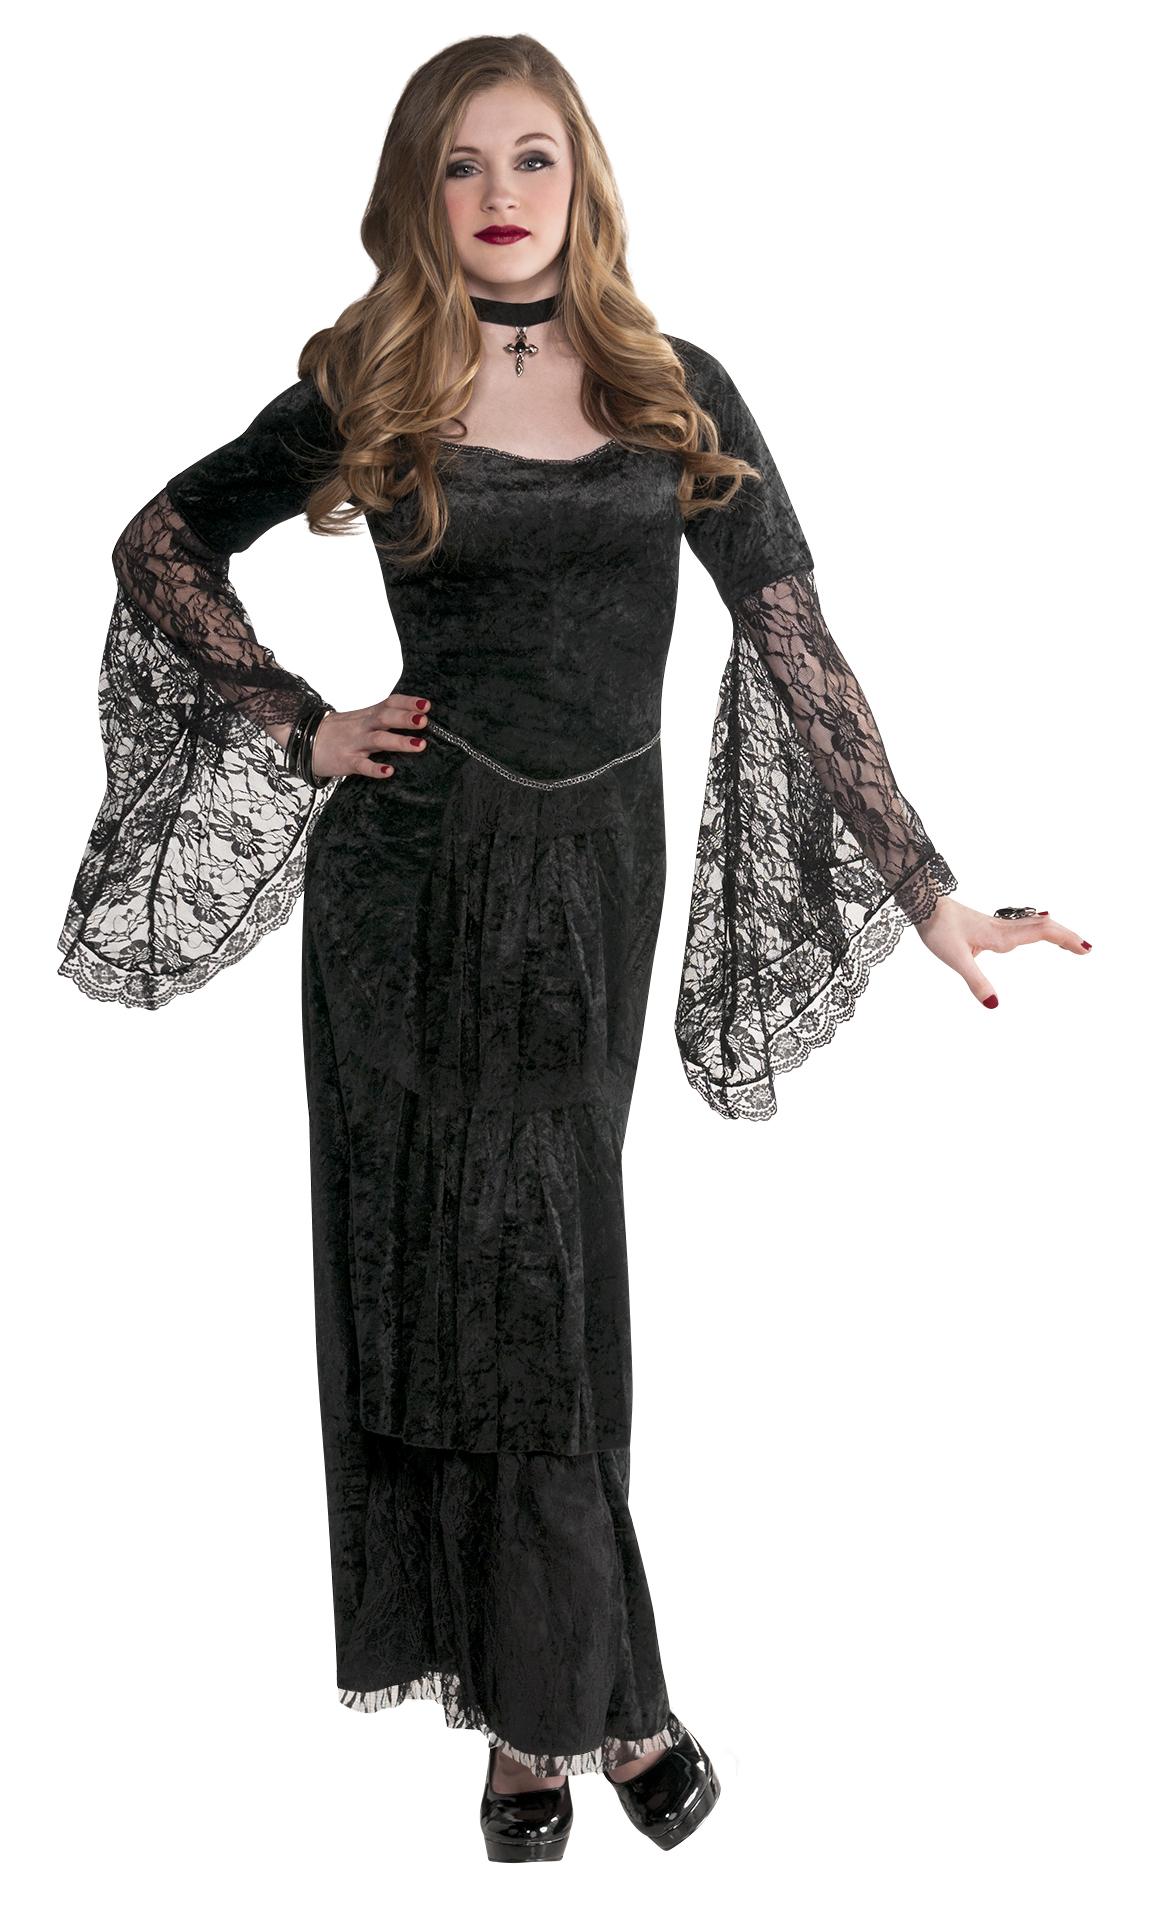 Teen Black Gothic Temptress Girls Halloween Party Fancy Dress ...